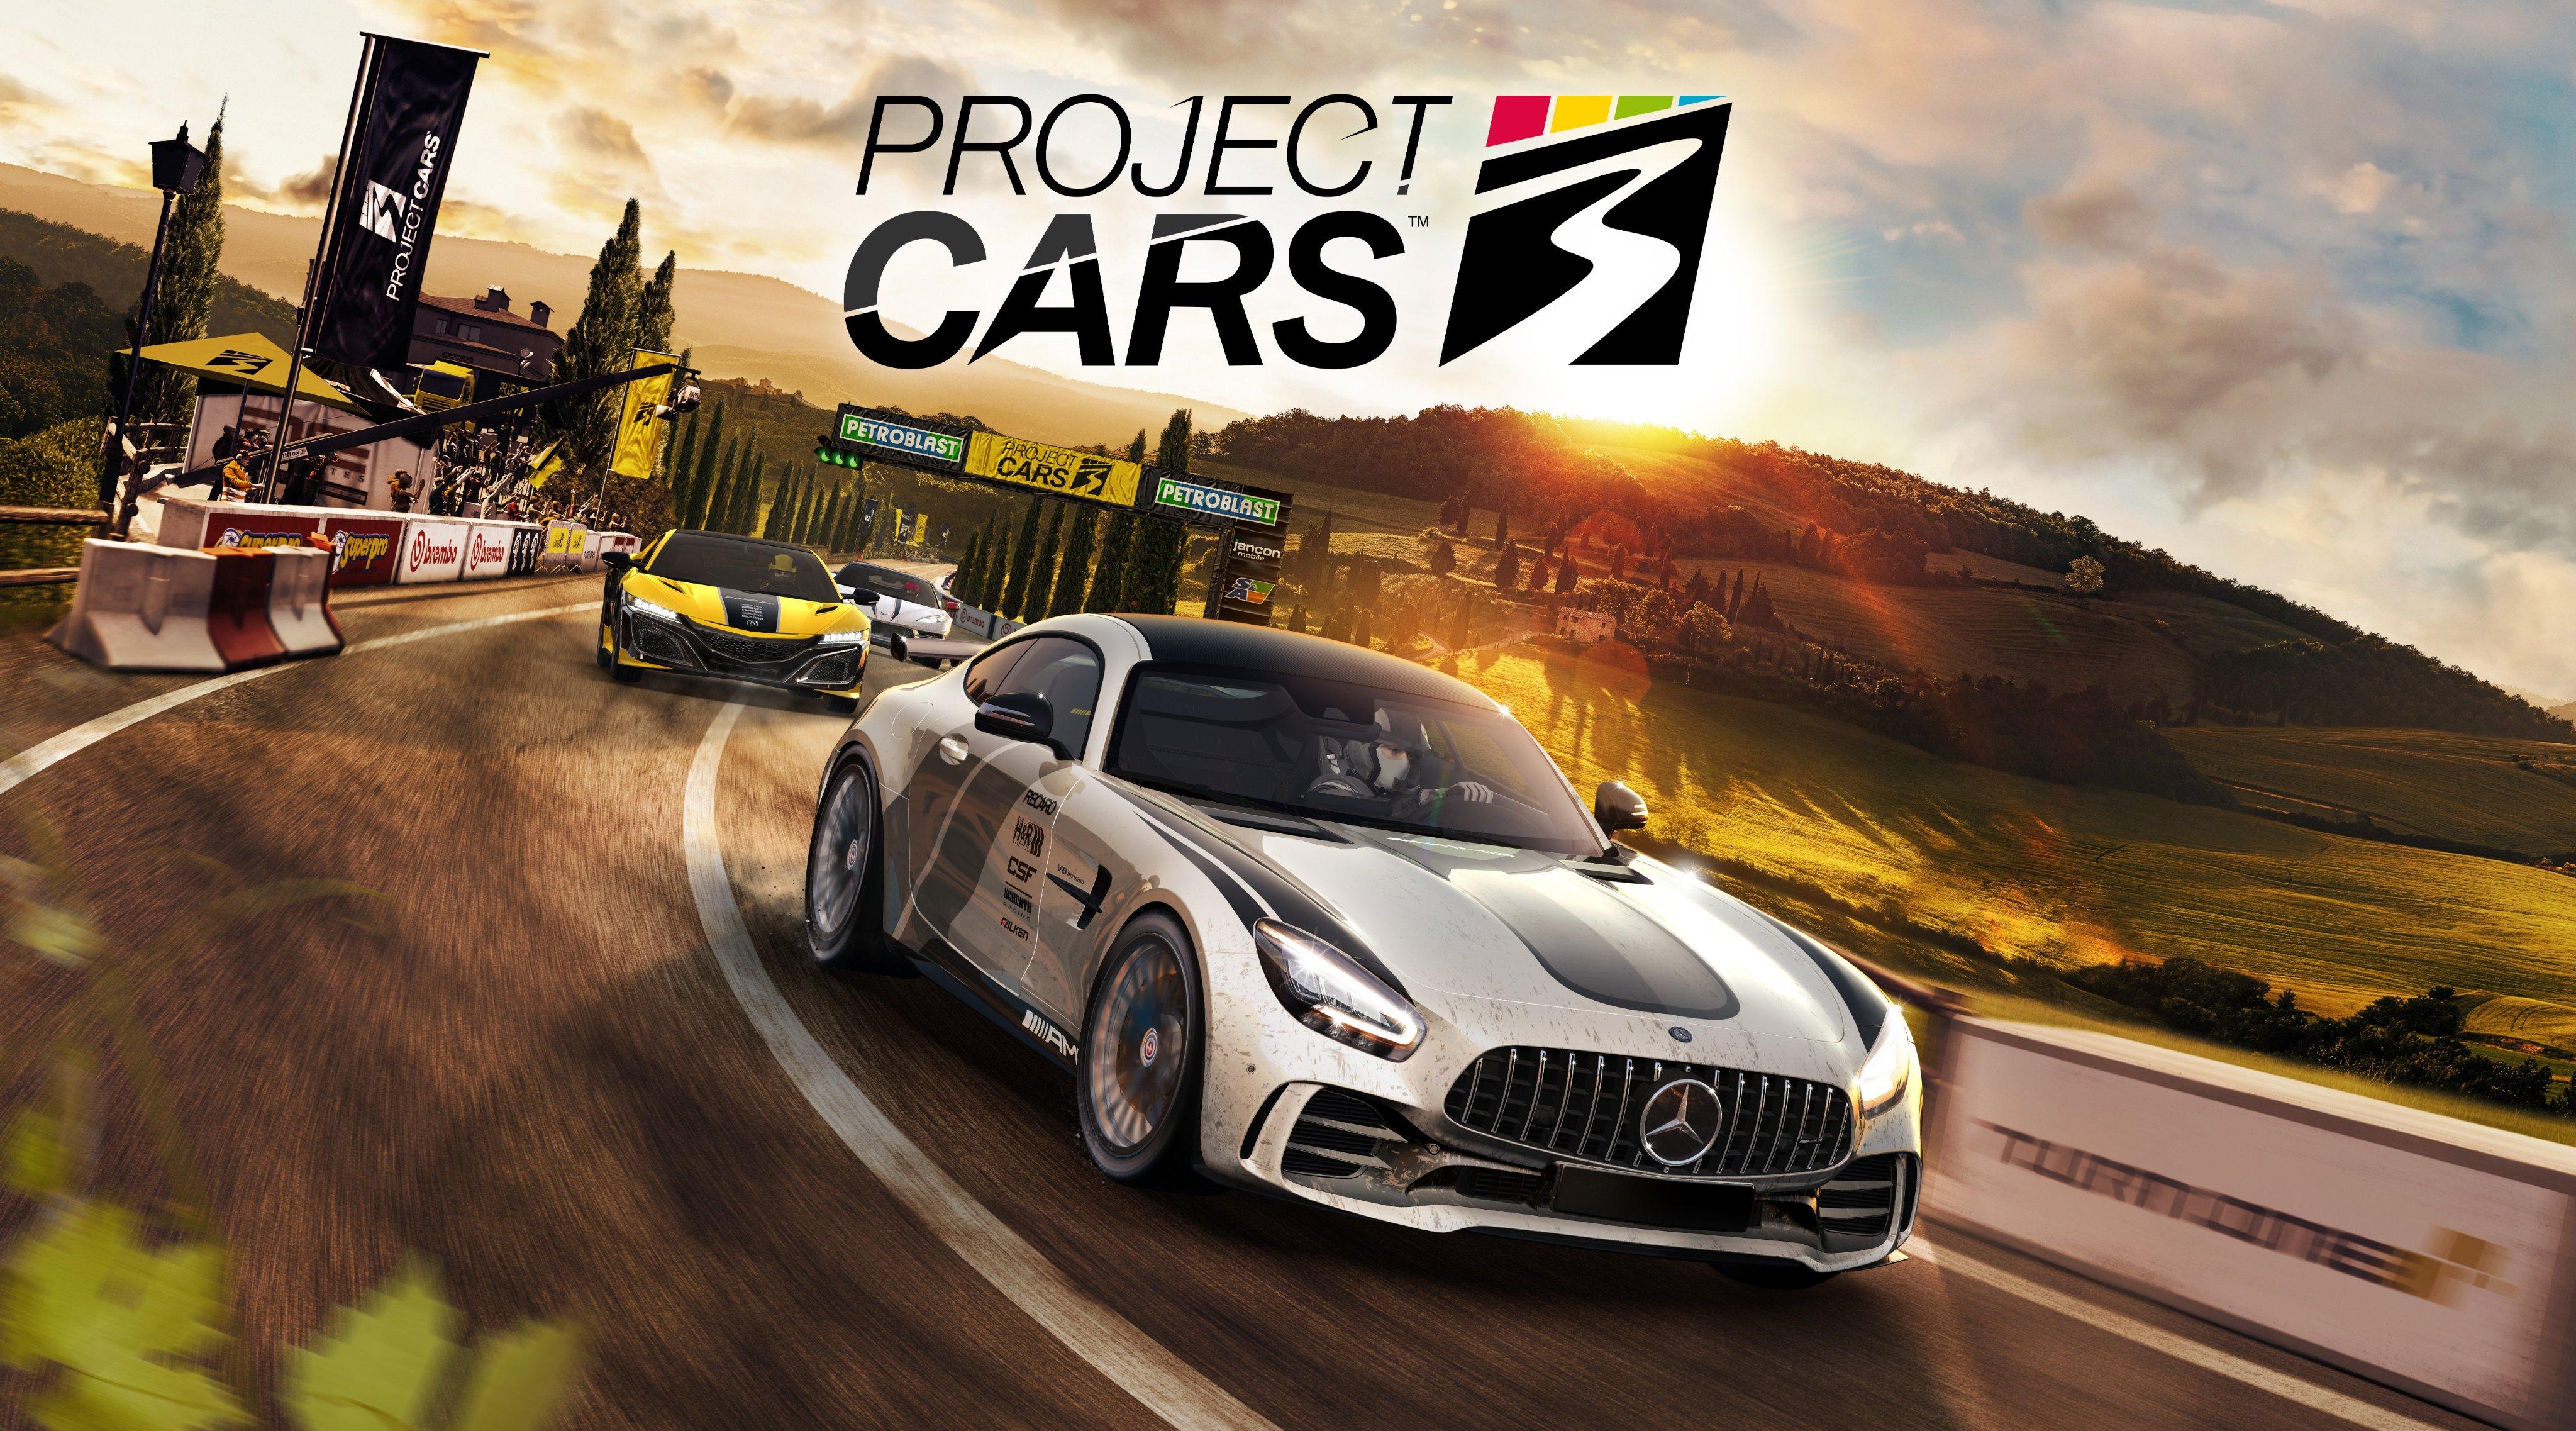 Project CARS 3 выйдет на ПК, PS4 и Xbox One / twitter.com